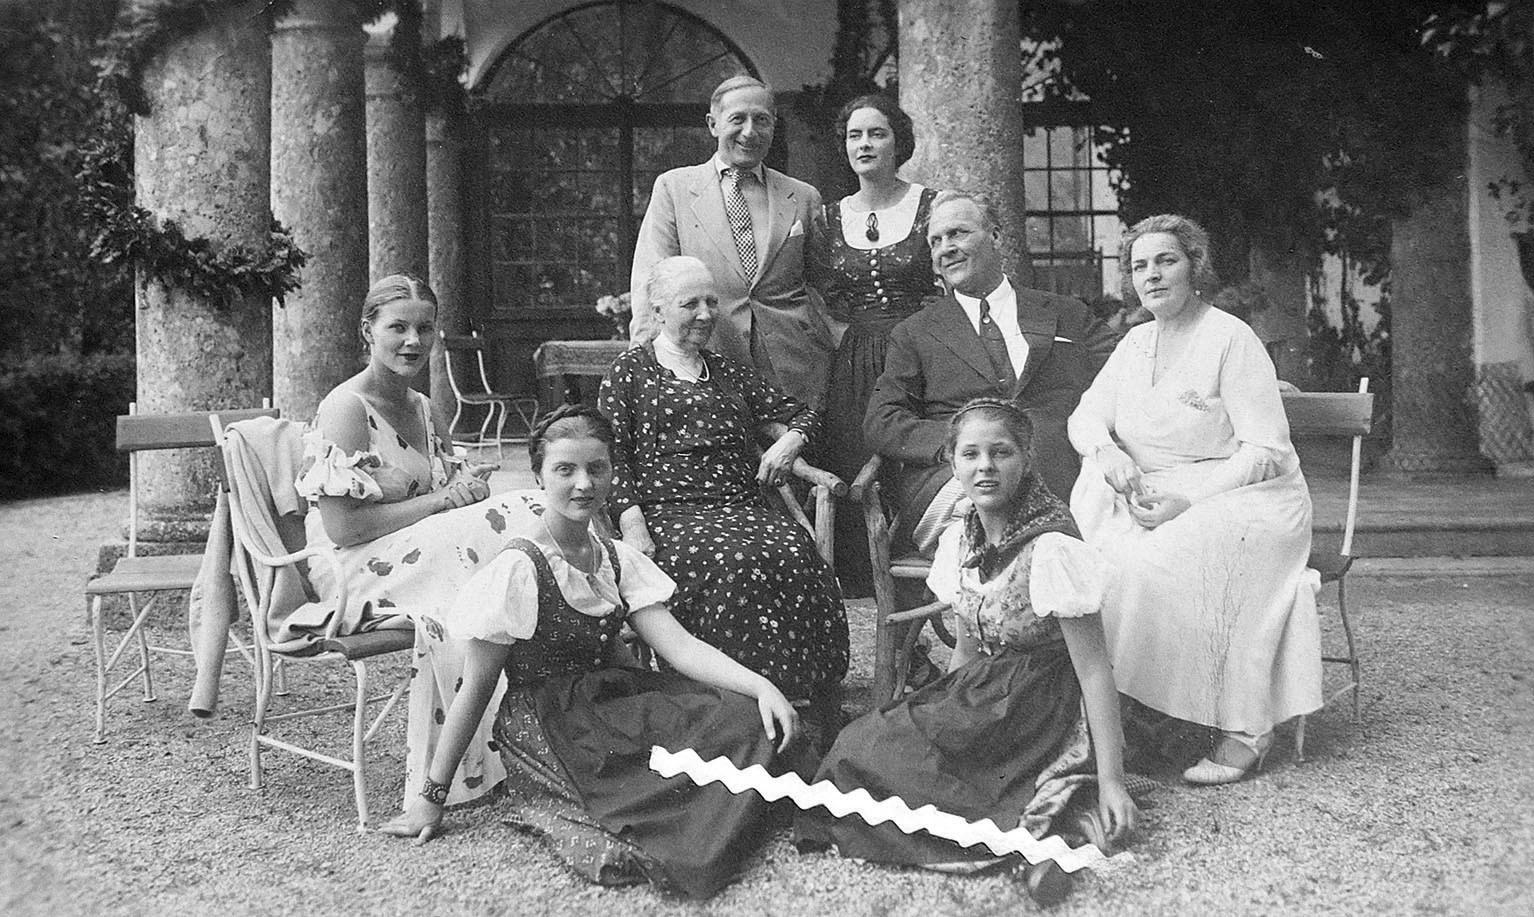 Keluarga Chaliapin di Tyrol, Kitzbuehel, 1934.